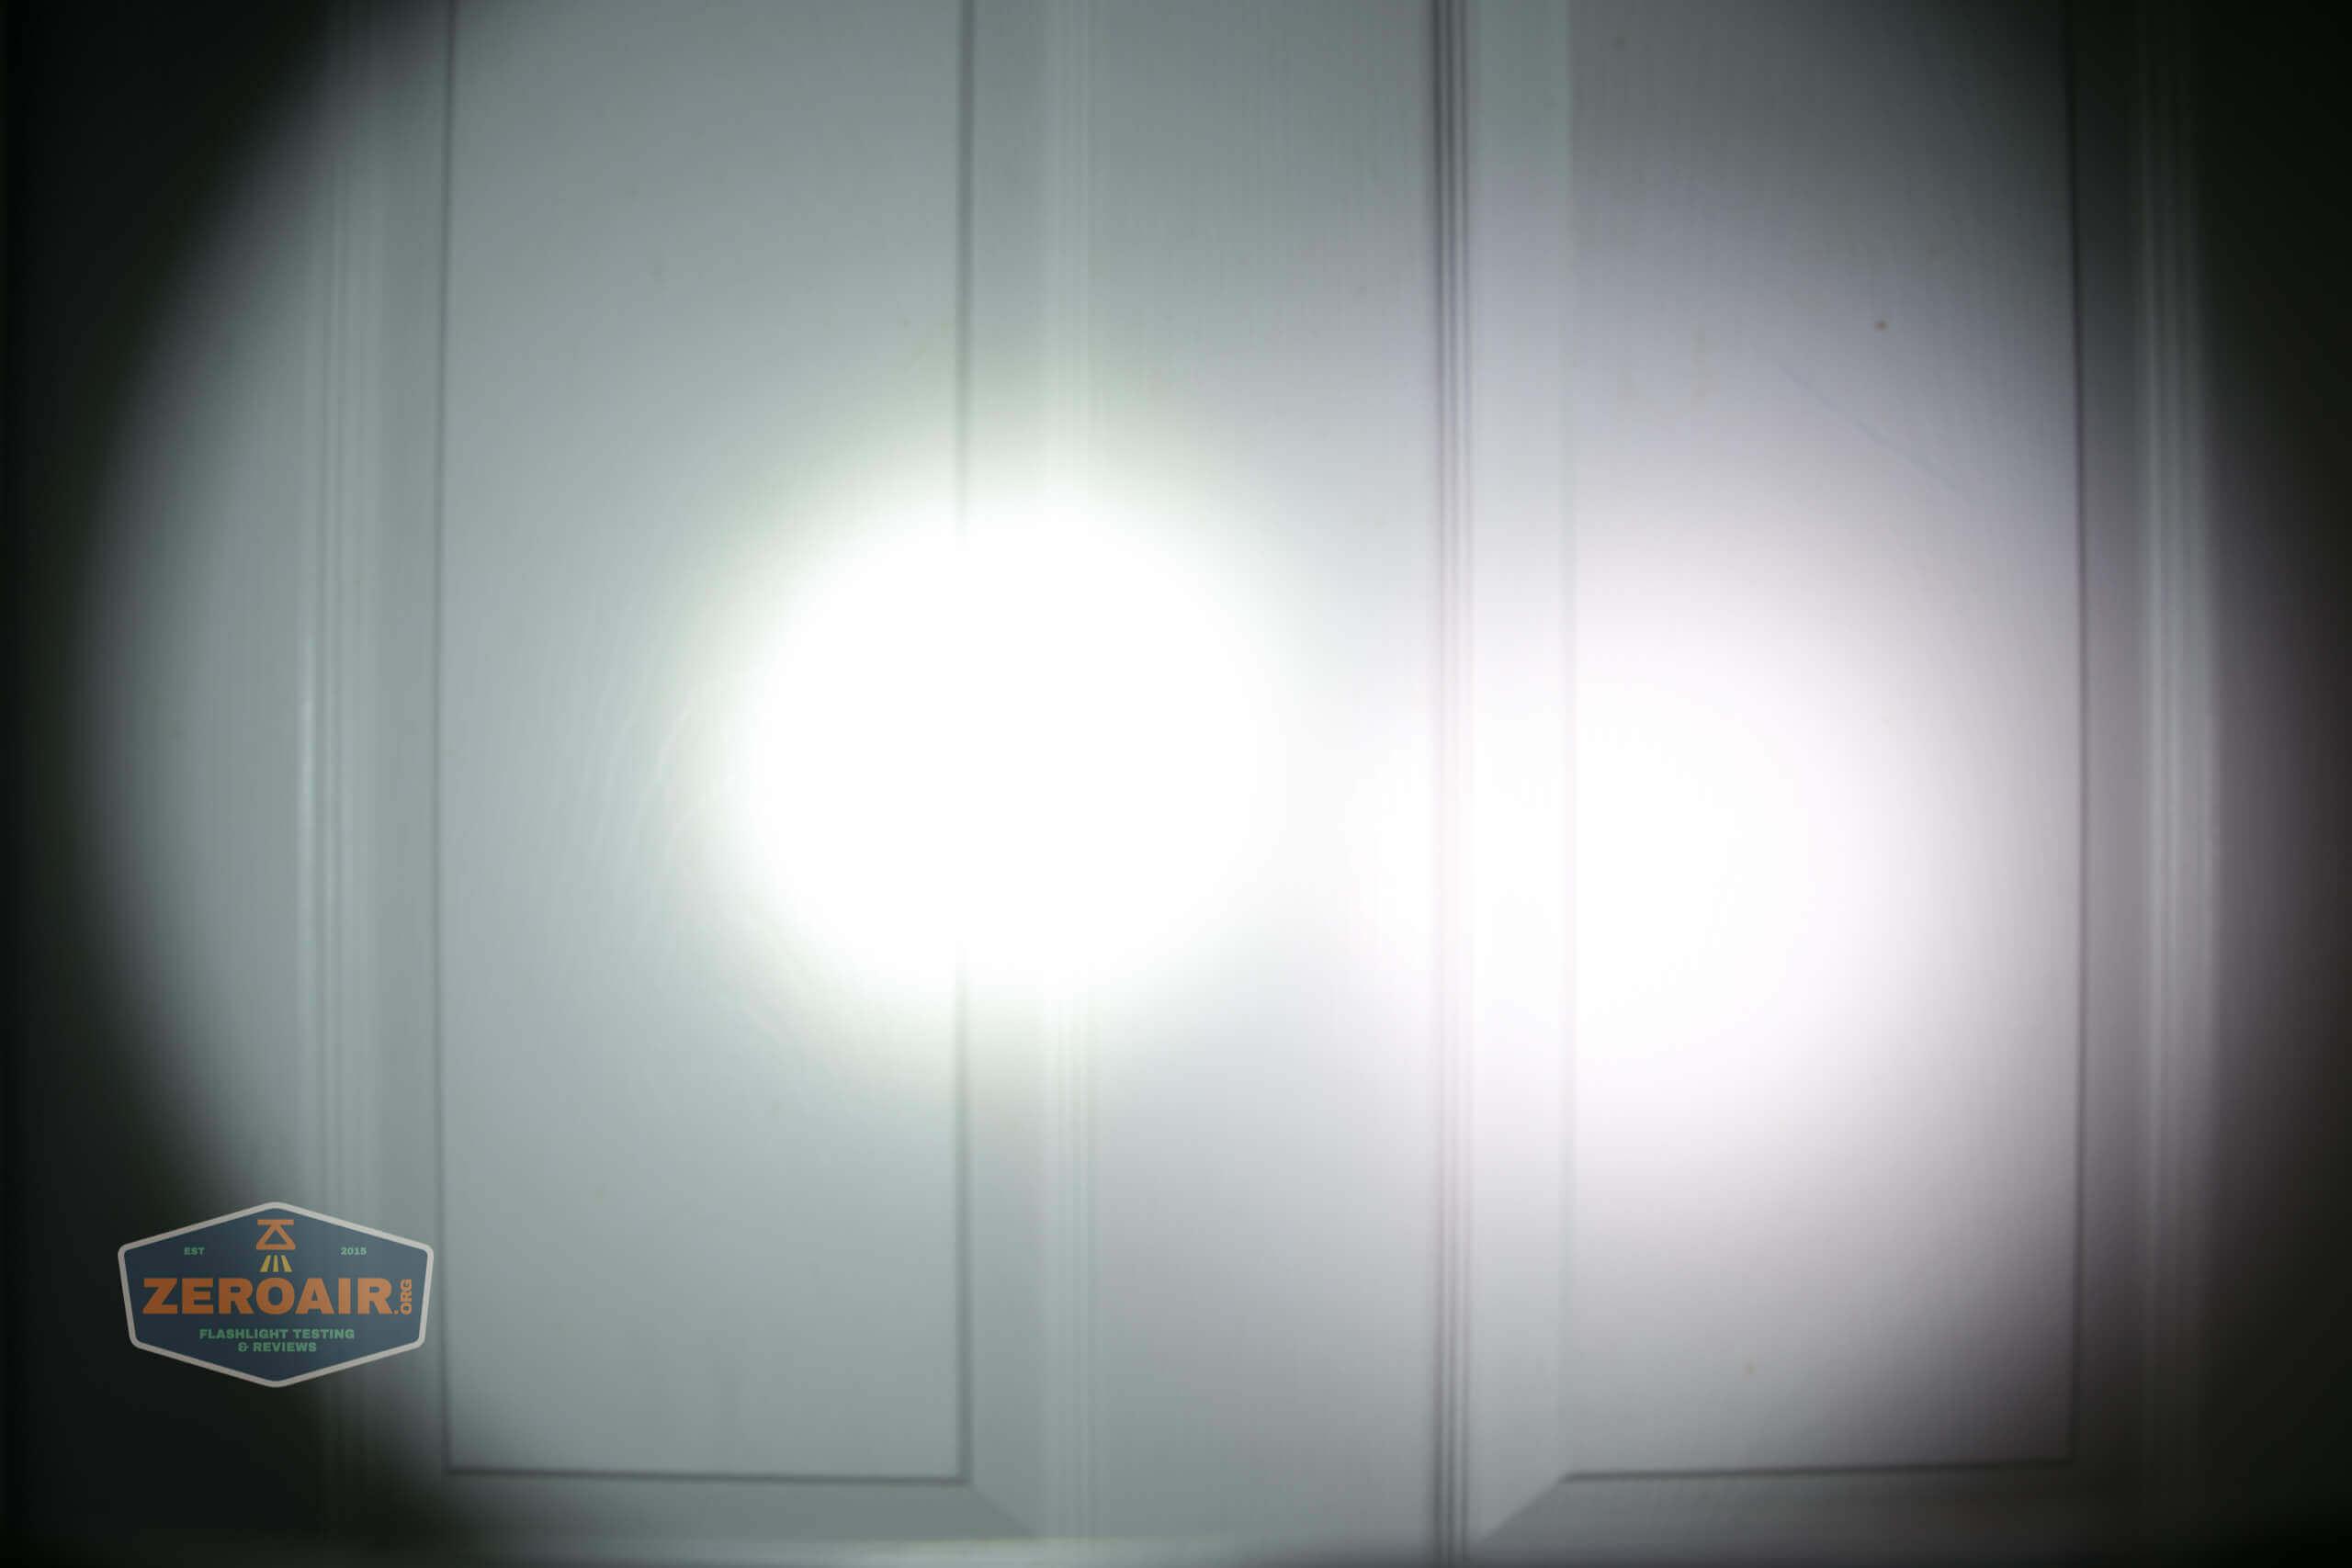 skilhunt m300 18650 flashlight beamshot door 4